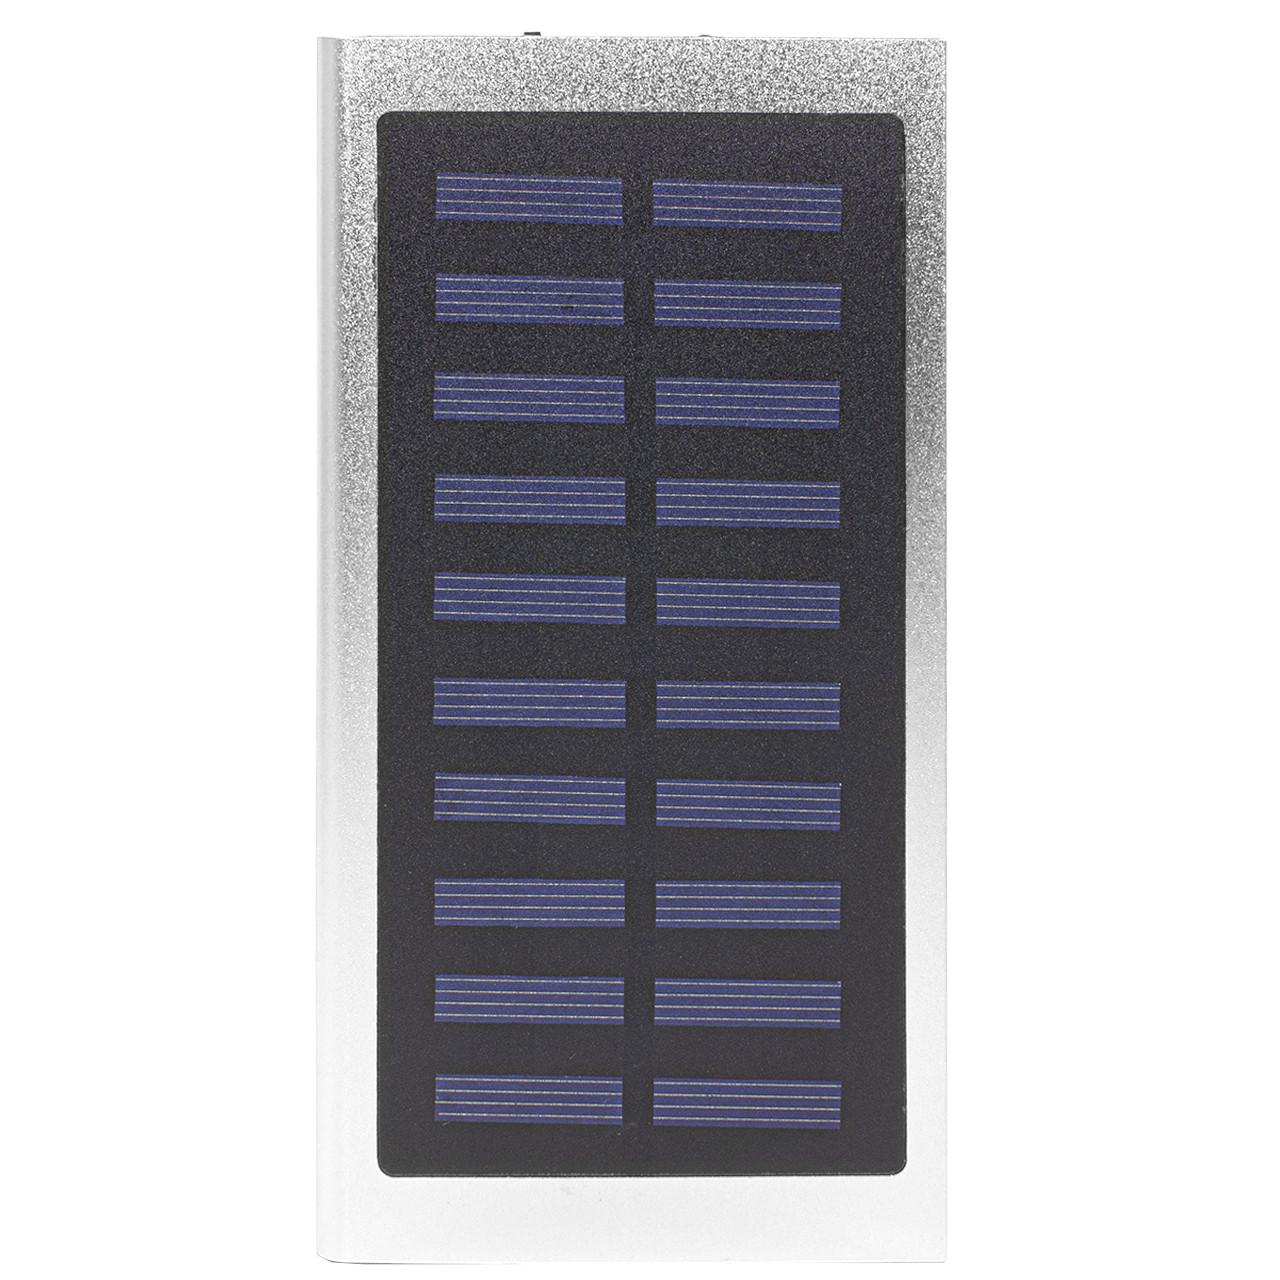 Внешний аккумулятор Power bank Solar Water Cube 8000 mAh портативная солнечная батарея Silver (258-10392)